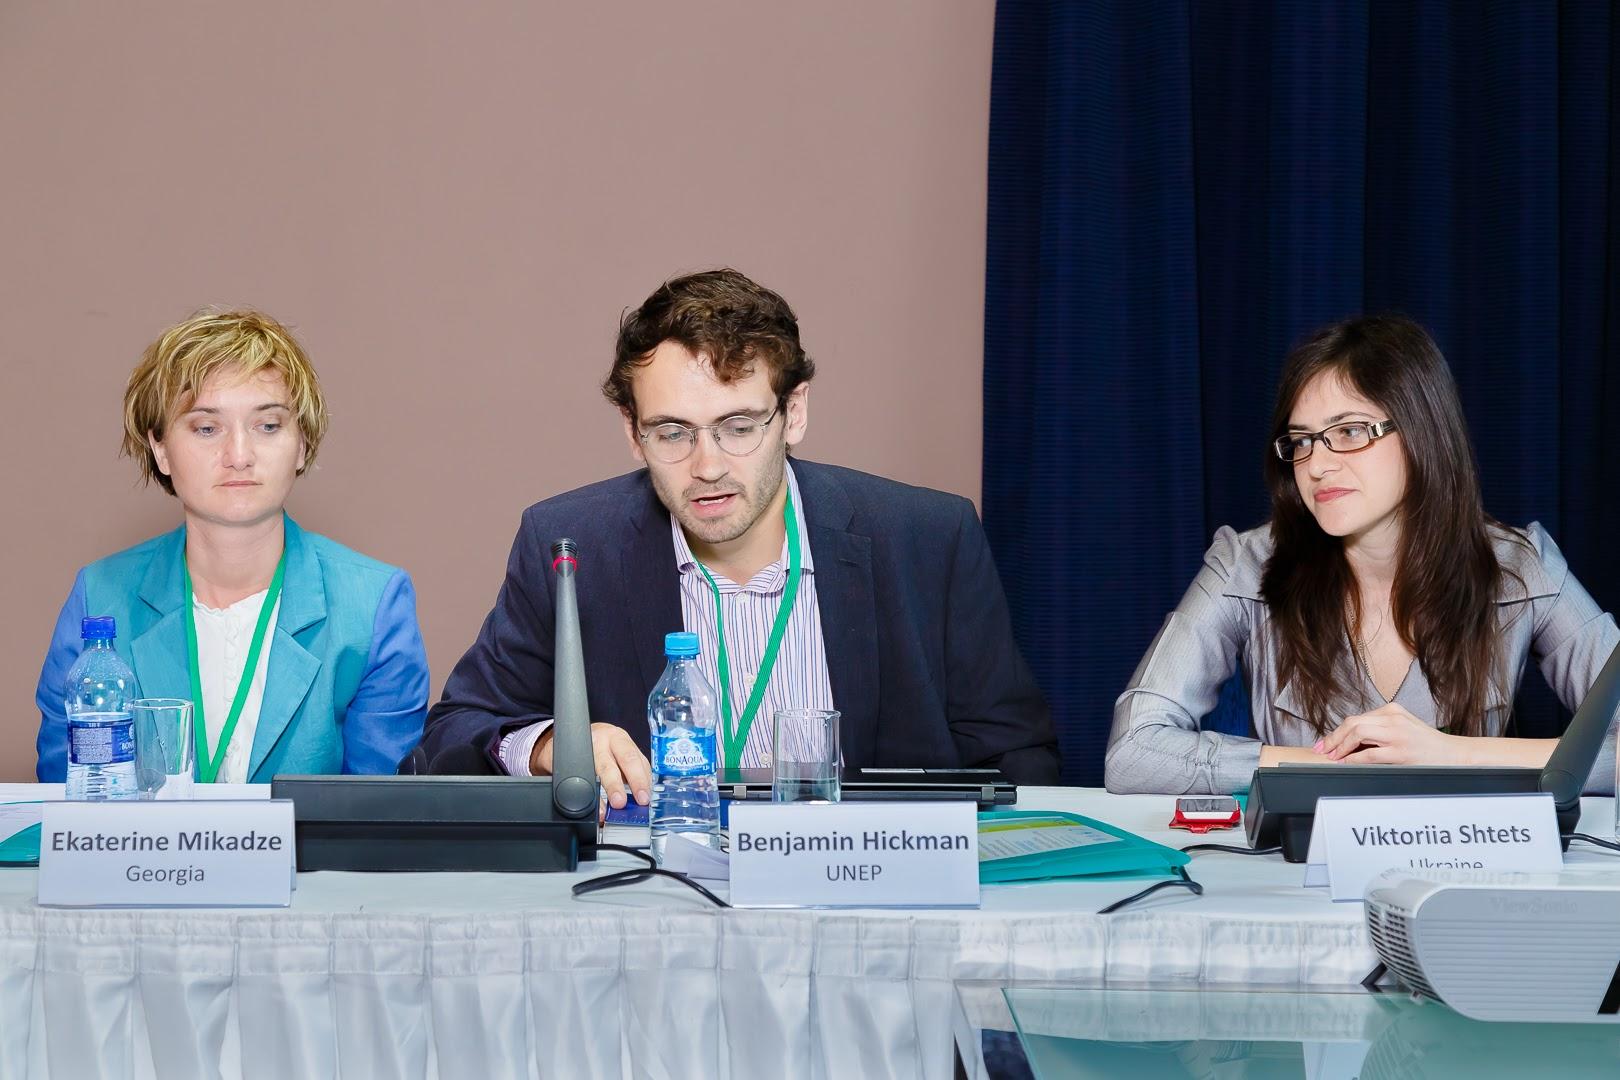 konferenciya_2016-122.jpg